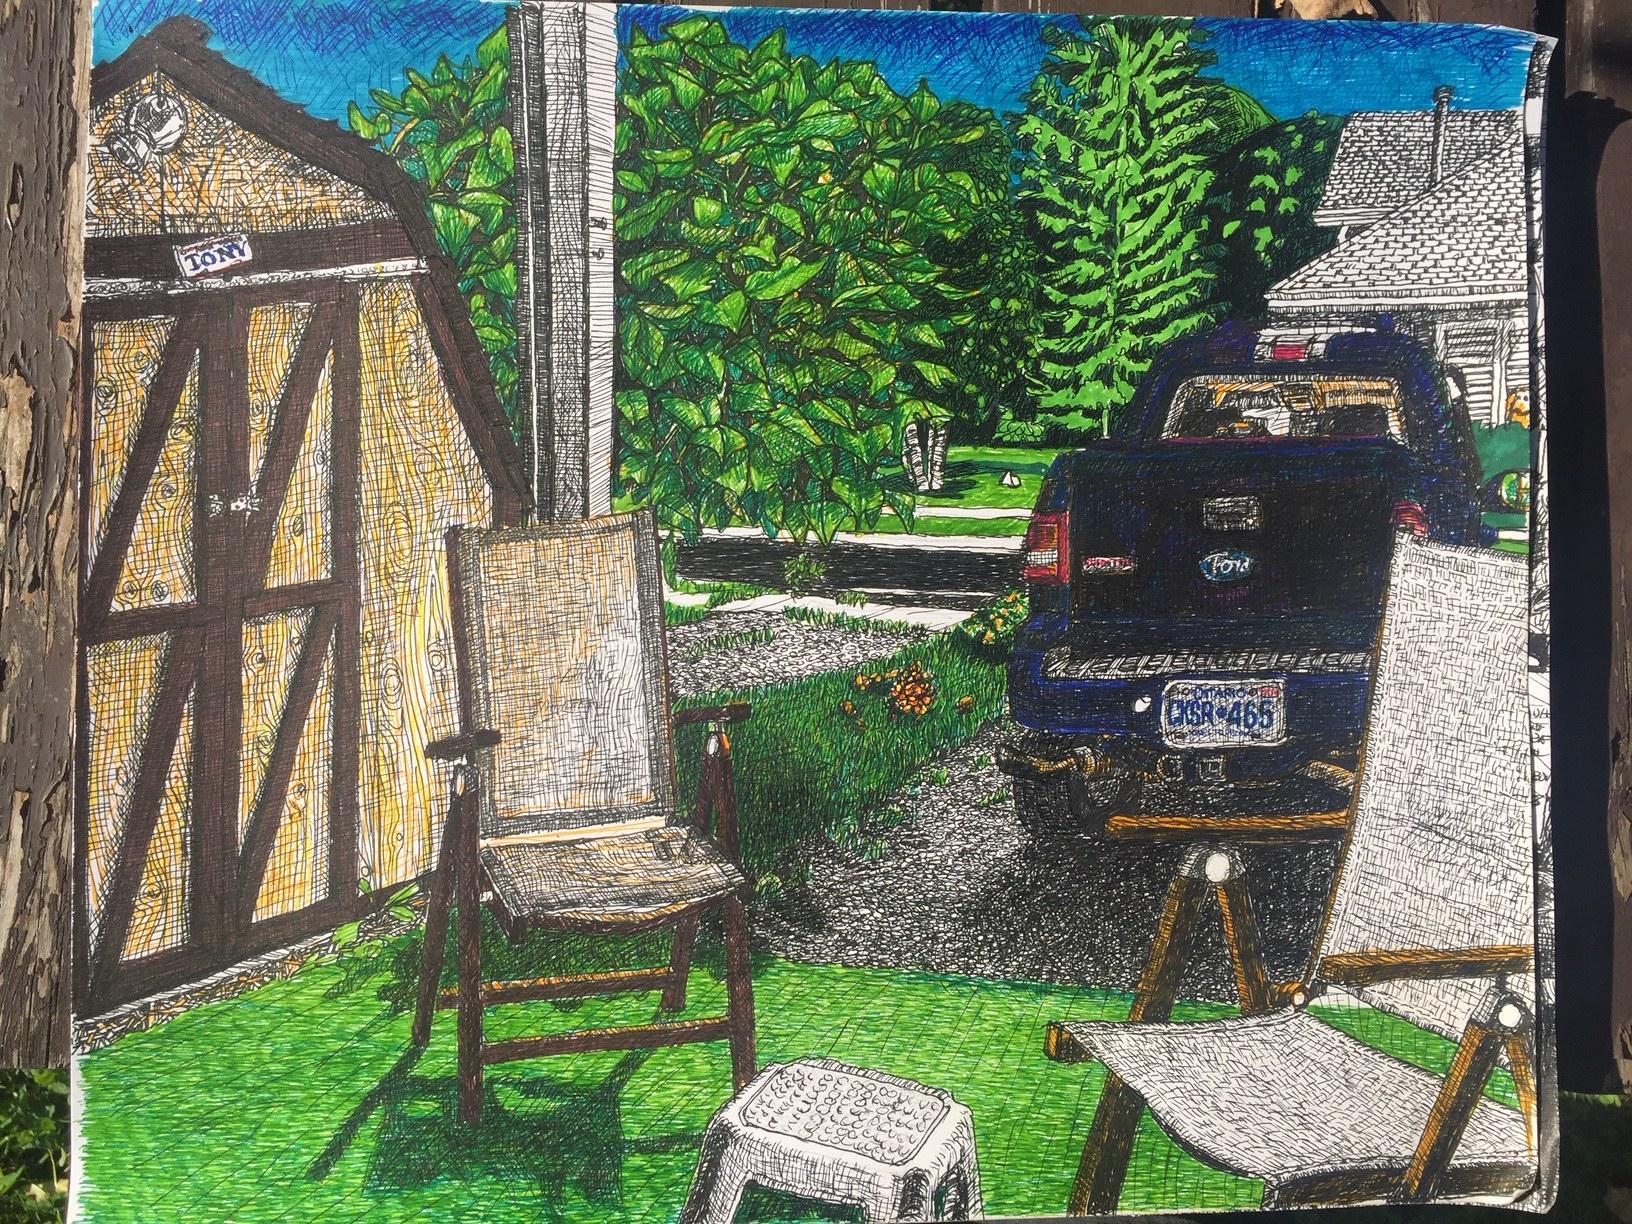 tonys-shed---2235-manchester-drive-by-cork-ireland-freelance-artist---art-van-leeuwen